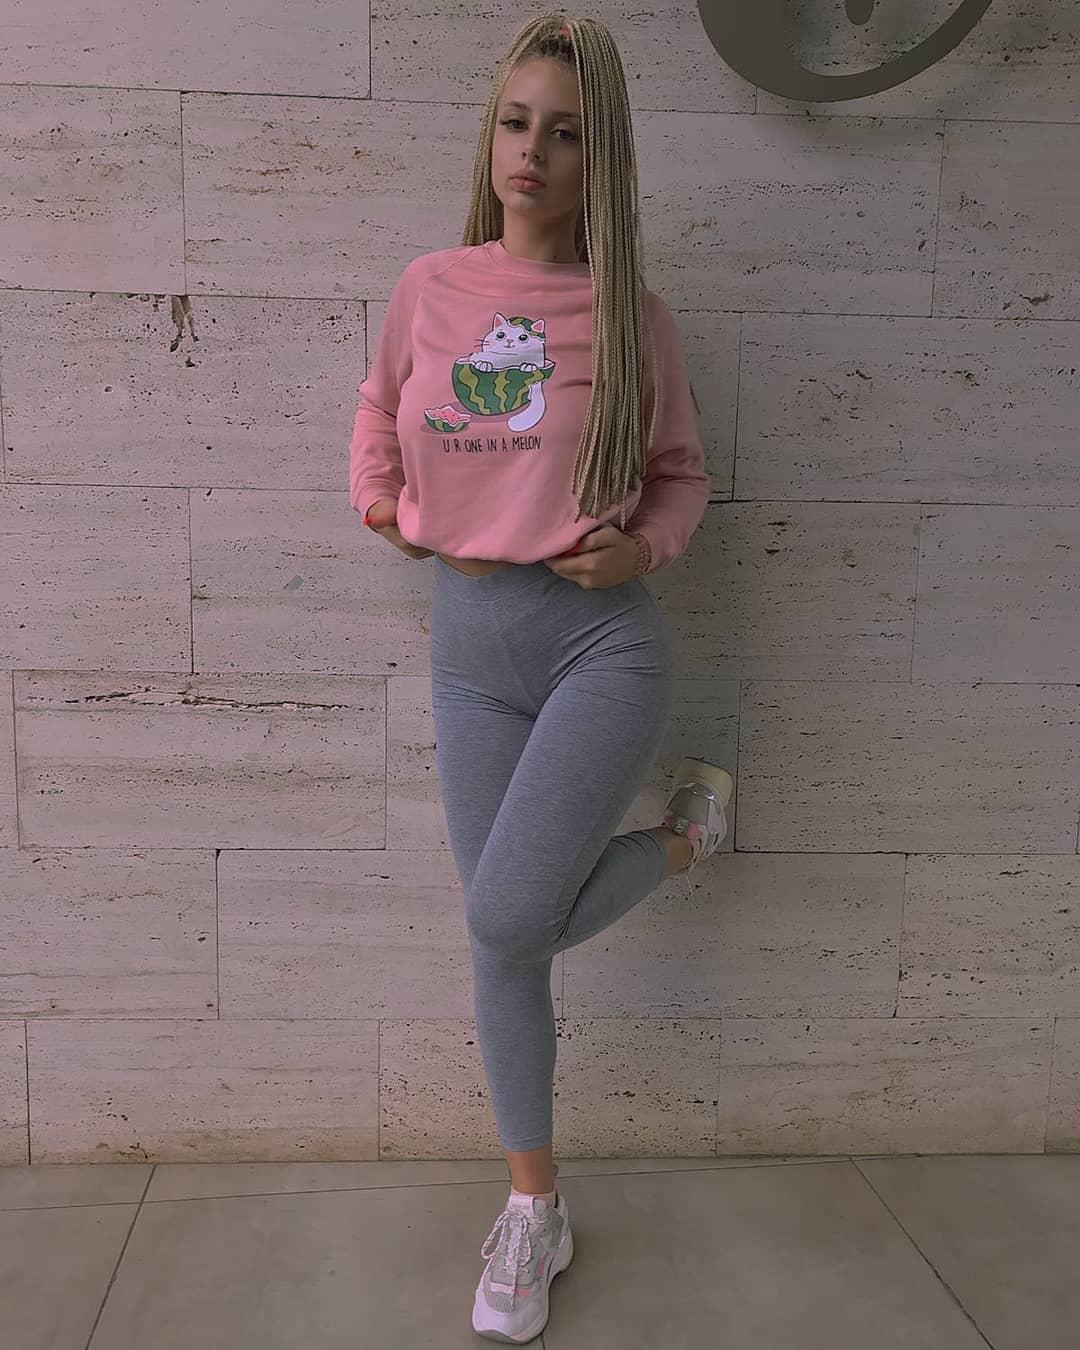 Jana-Zivkovic-Wallpapers-Insta-Fit-Bio-7